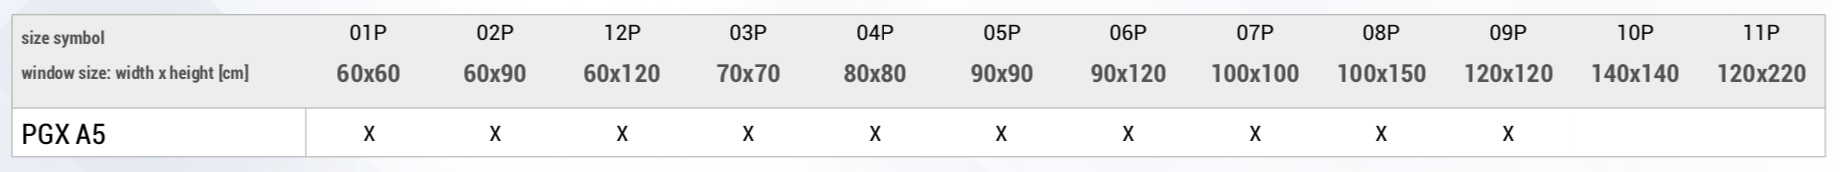 Beschikbare maten platdakraam Intura PGX A5 beloopbaar glas